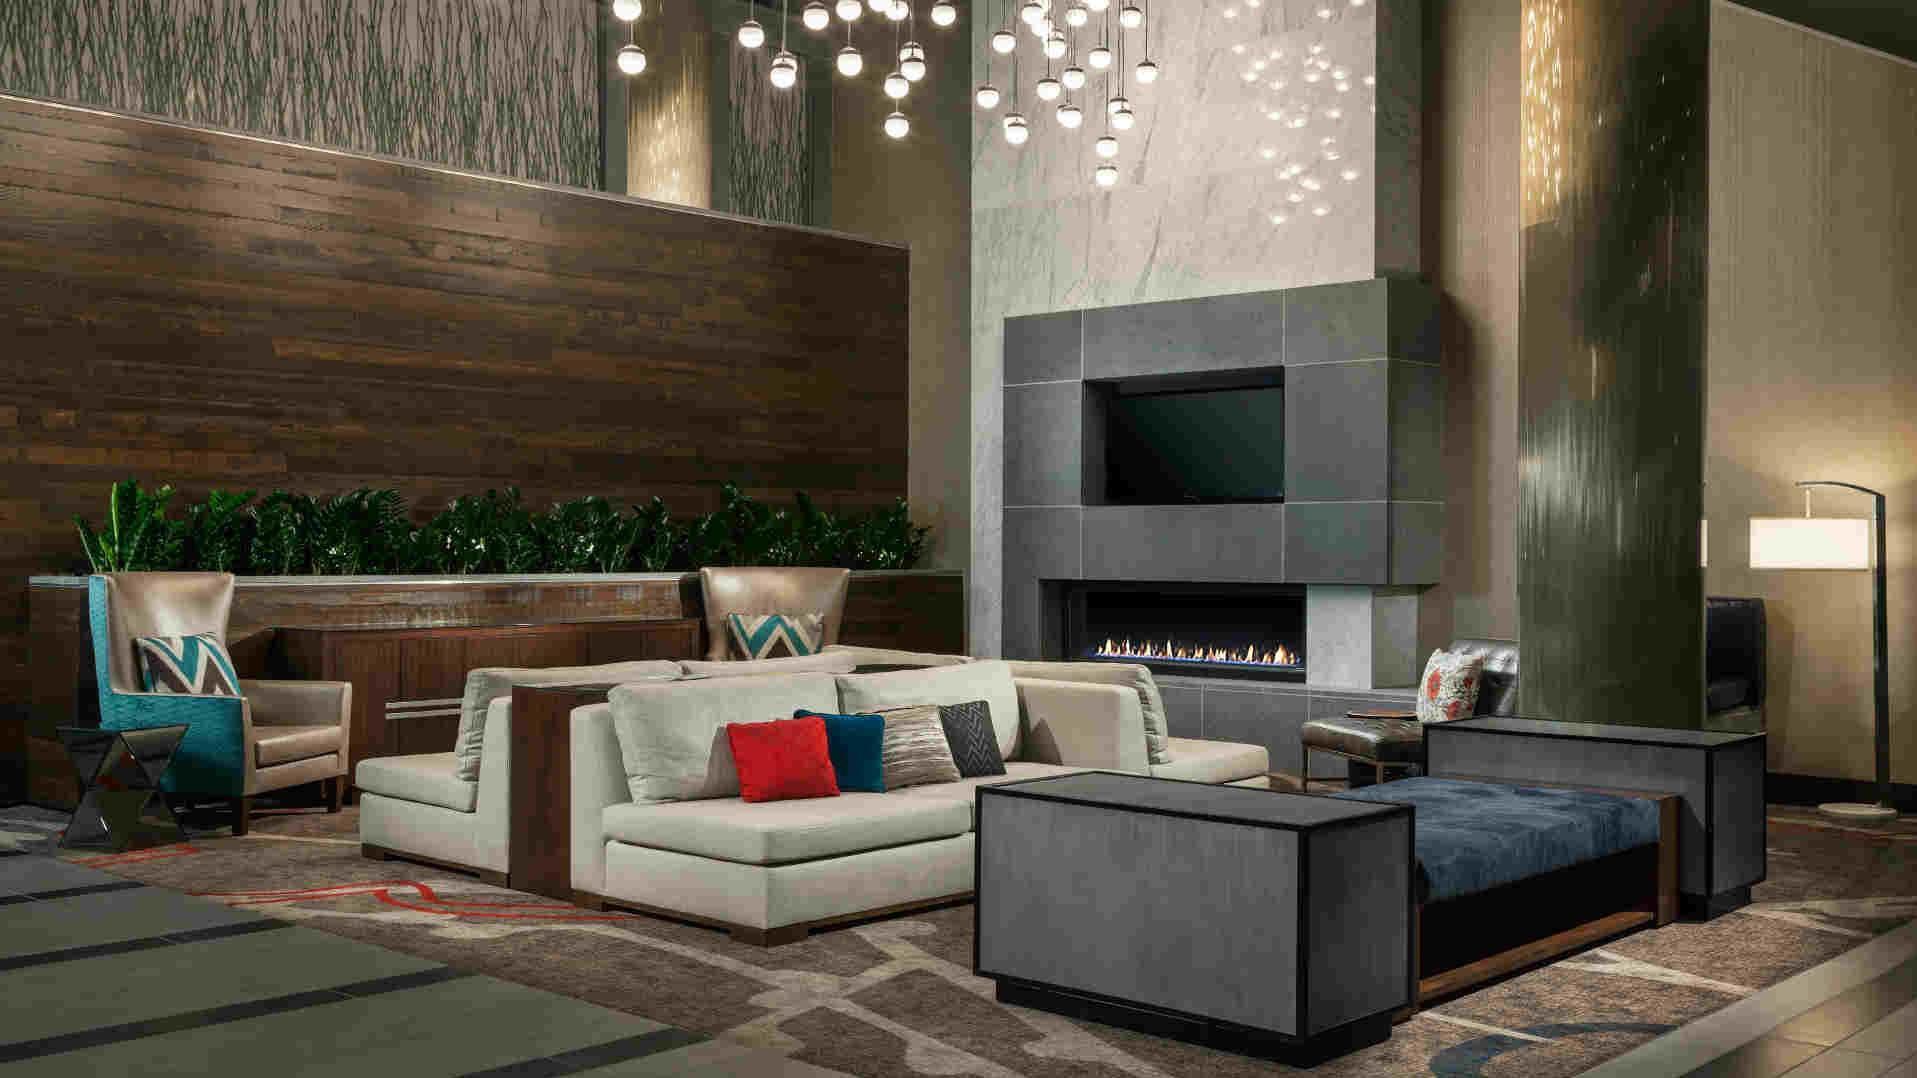 Meetings & Events at Hilton Garden Inn Washington DC Geor own